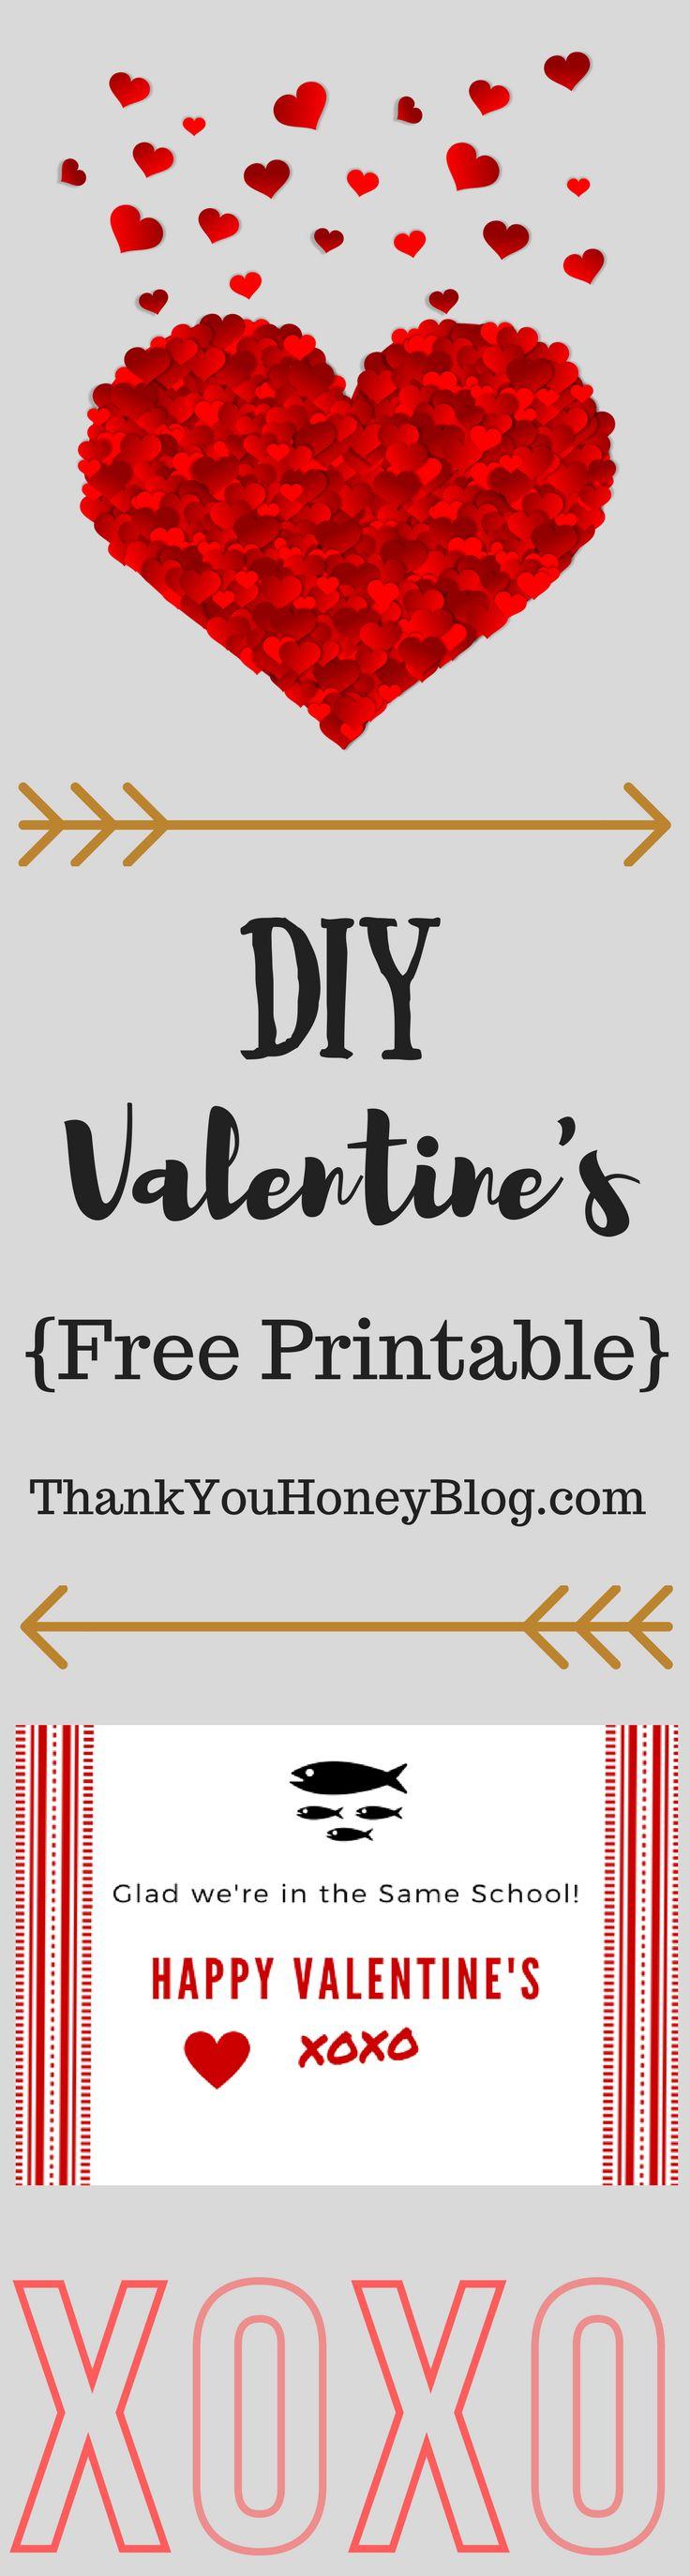 DIY Valentine's {Free Printables},#ValentinesDay, Adorable #HomemadeValentines, Last Minute Valentines, DIY Valentines, #Craft, #DIY, Homemade, #LastMinute, #Valentines, Kids, Kids Valentines